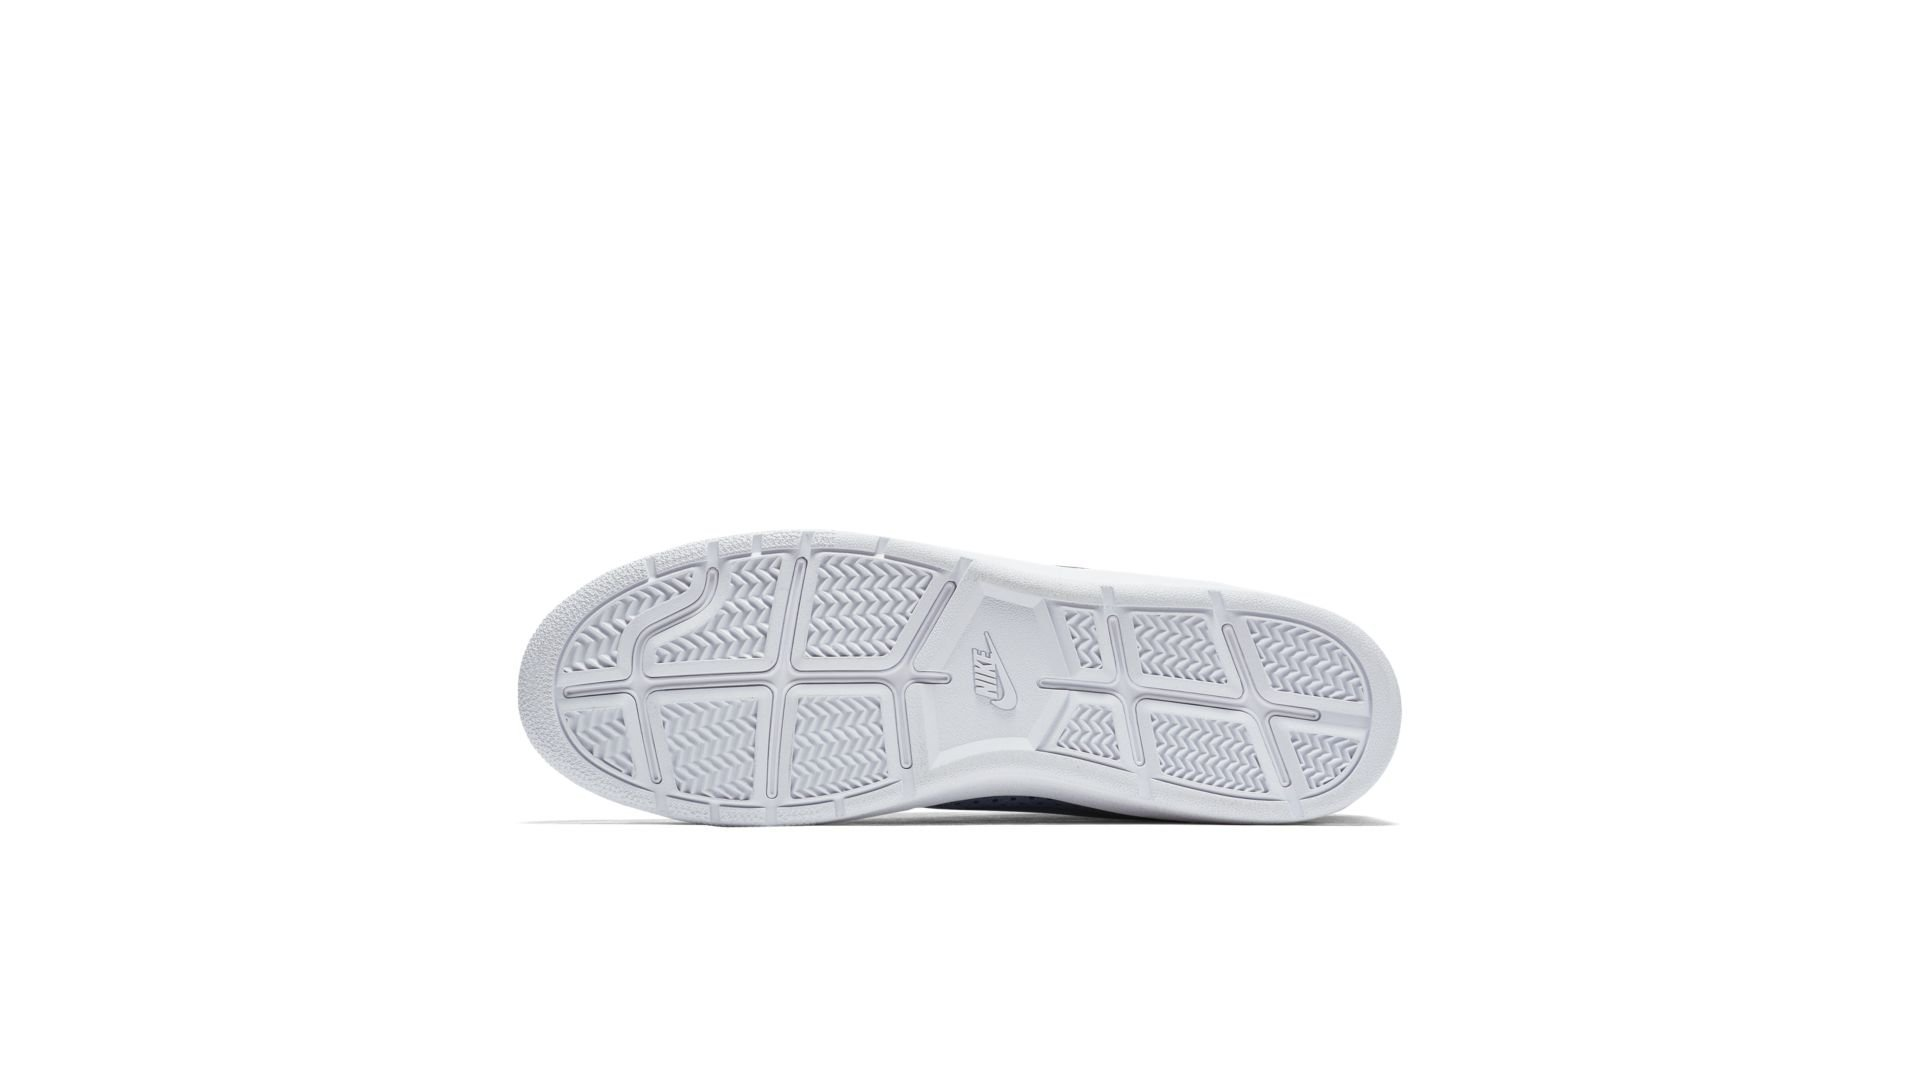 Nike Tennis Classic Ultra Ocean Fog (807175-401)